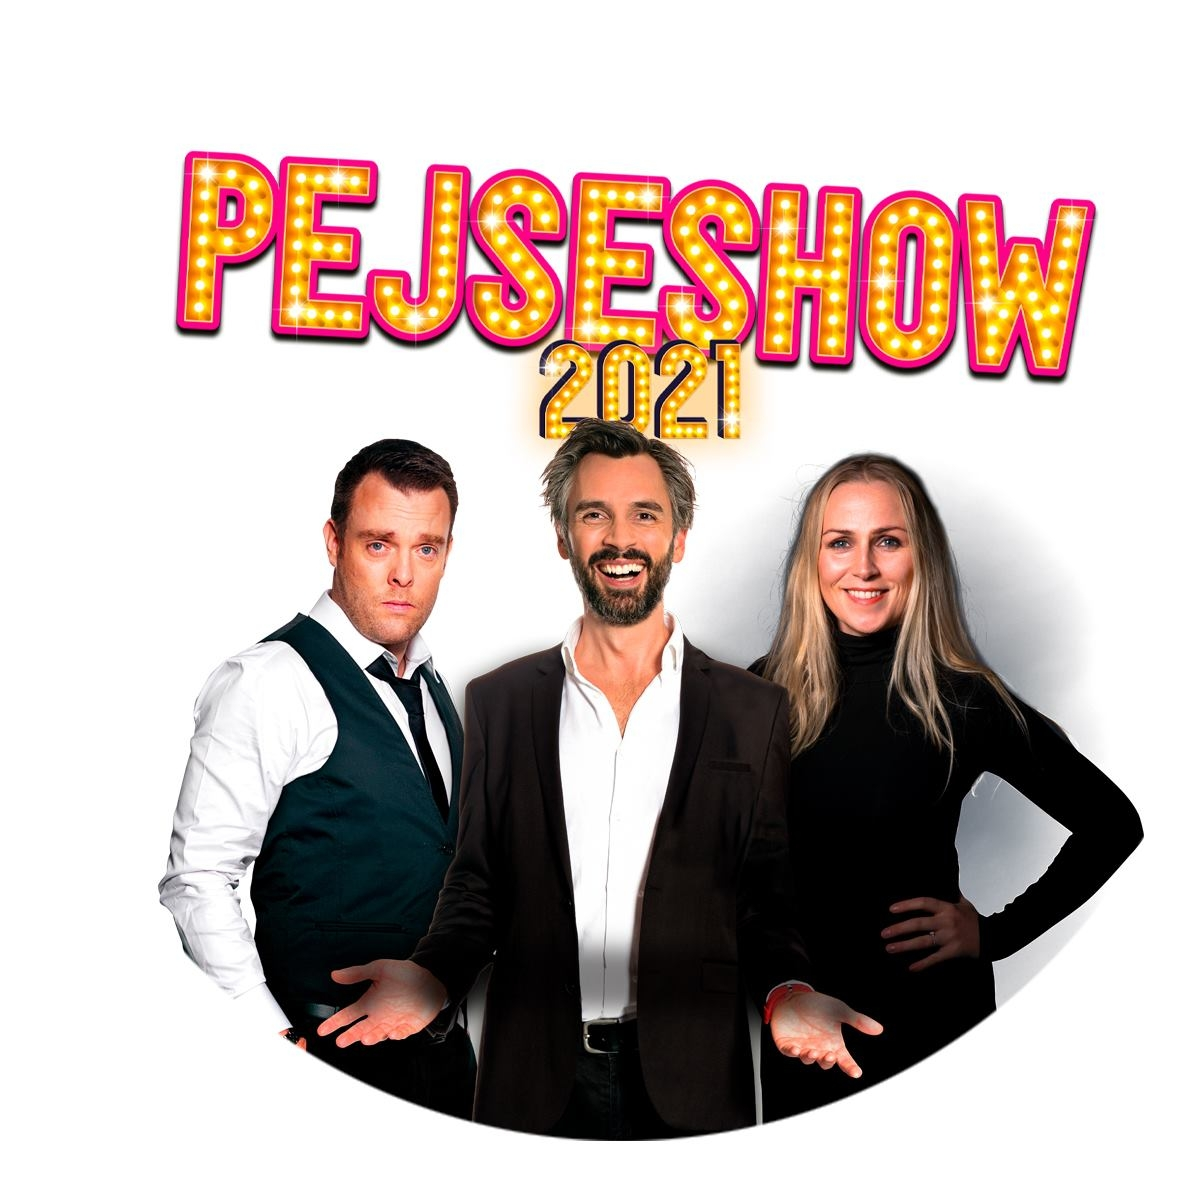 Anmeldelse: Pejseshow 2021, Pejsegården (Pejseshow)